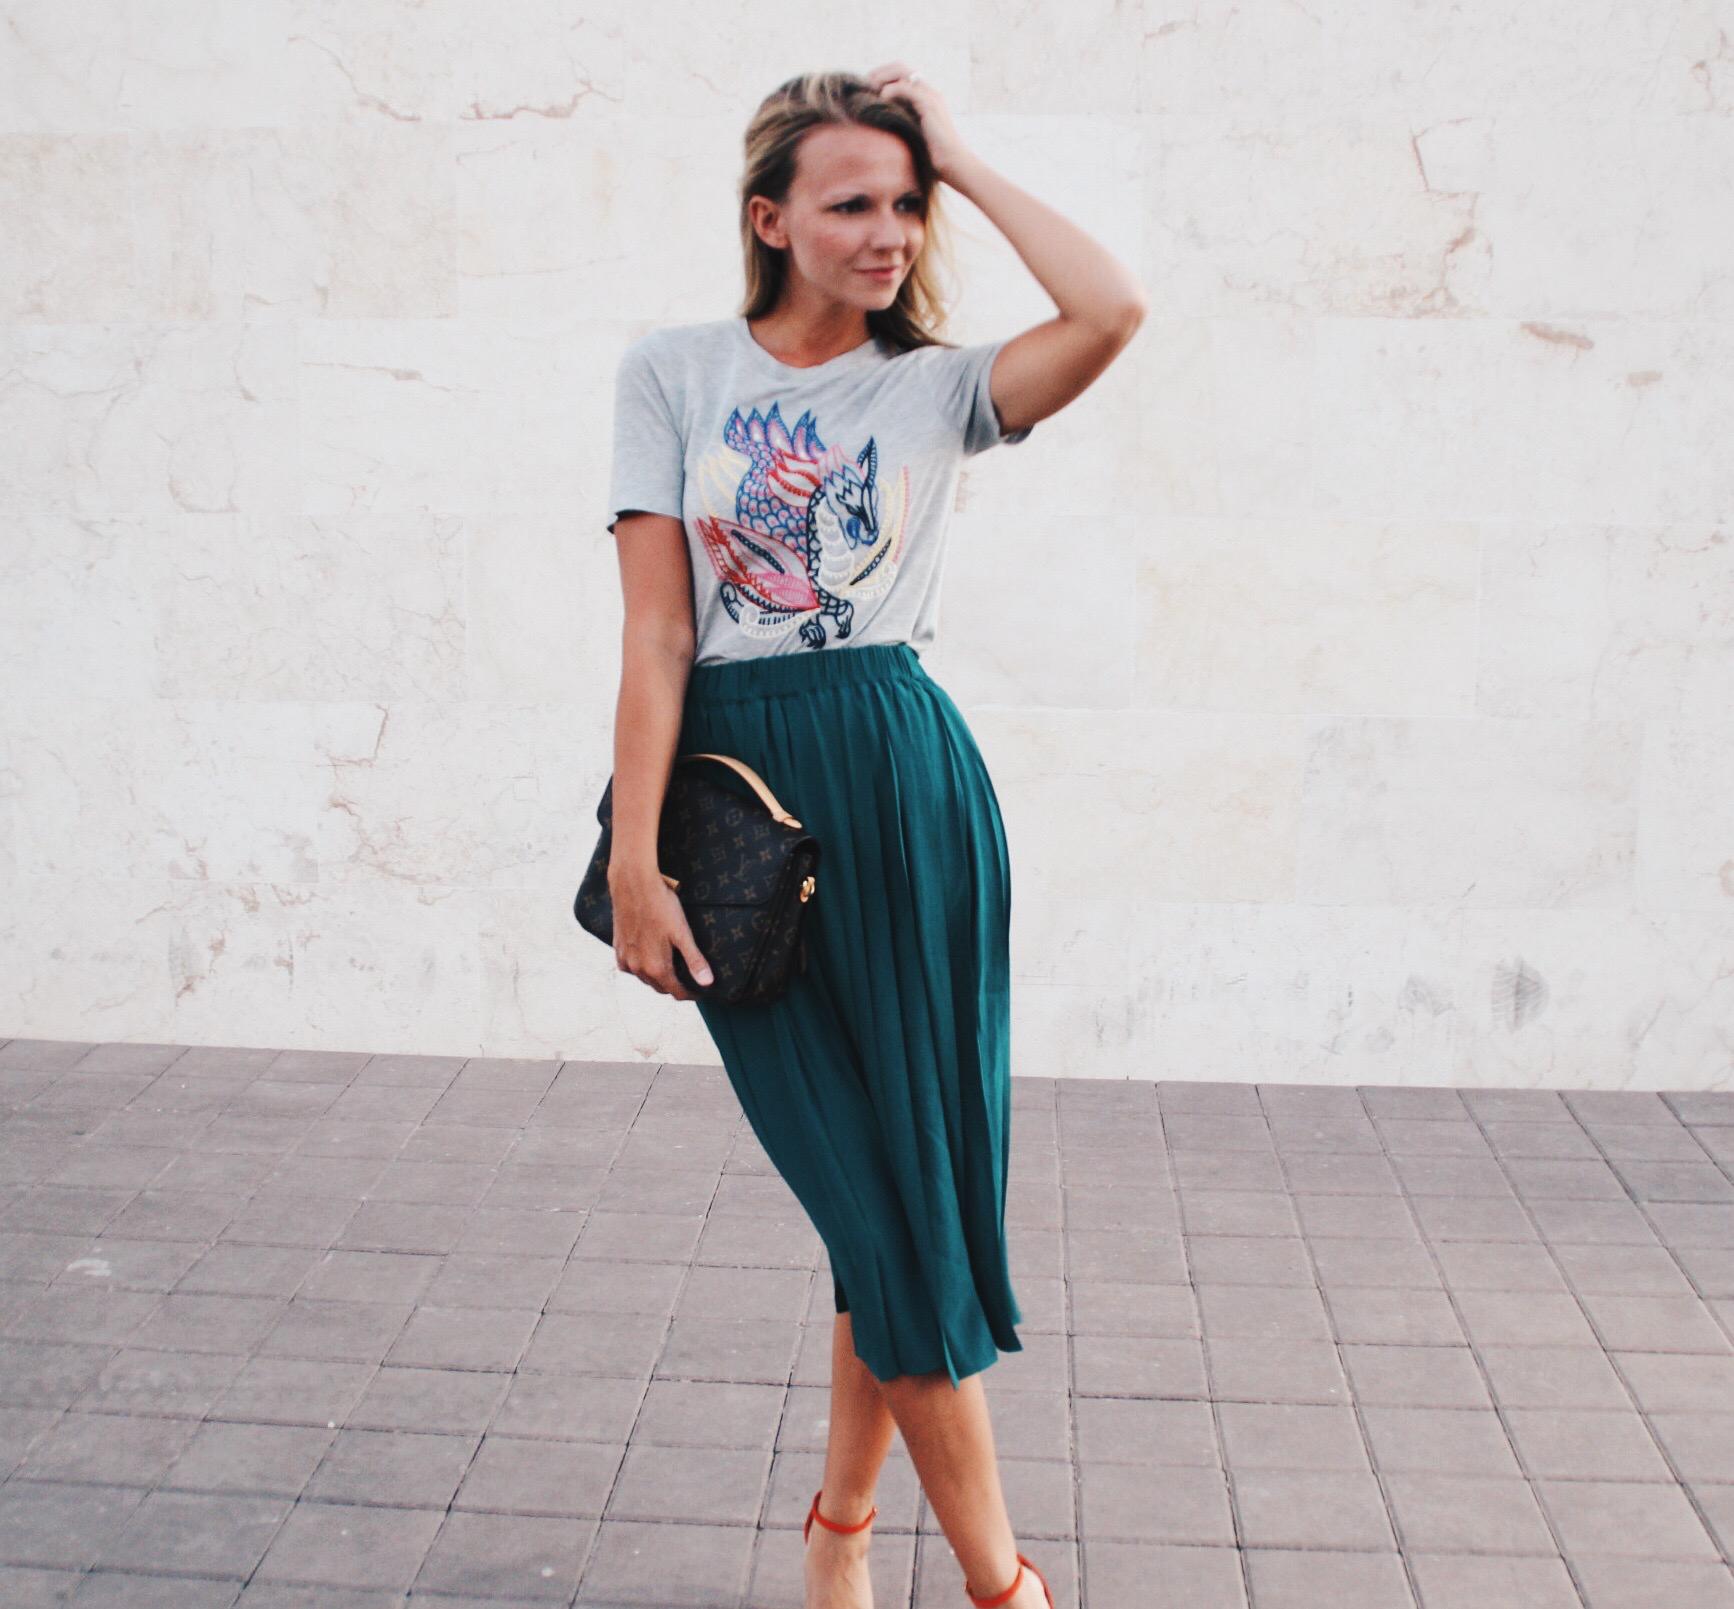 Dark Green Midi Skirt Fashion Mode Outfit Dubai Sandalen Rock T-Shirt H&M next Jennifer PepperAndGold UAE Lifestyle LouisVuitton LV Metis